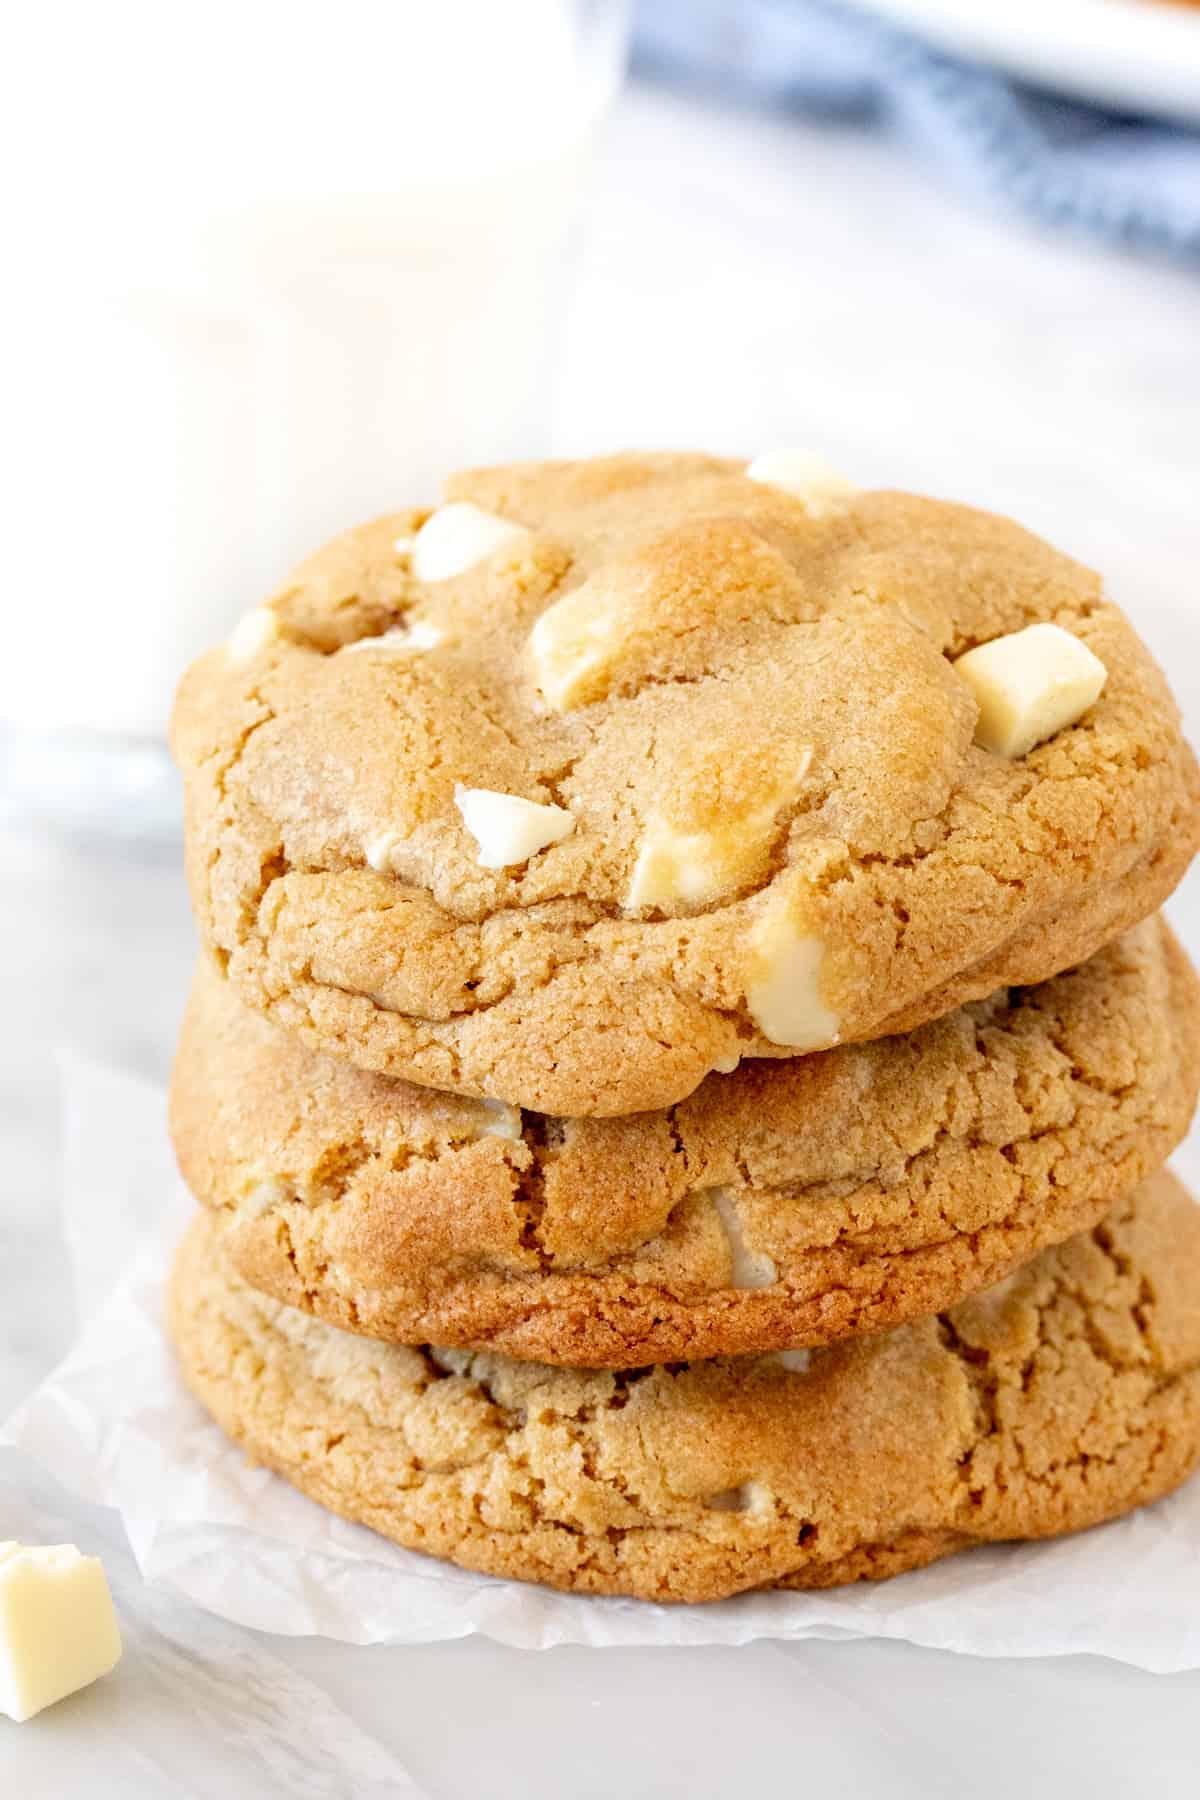 3 big levain-style white chocolate macadamia cookies